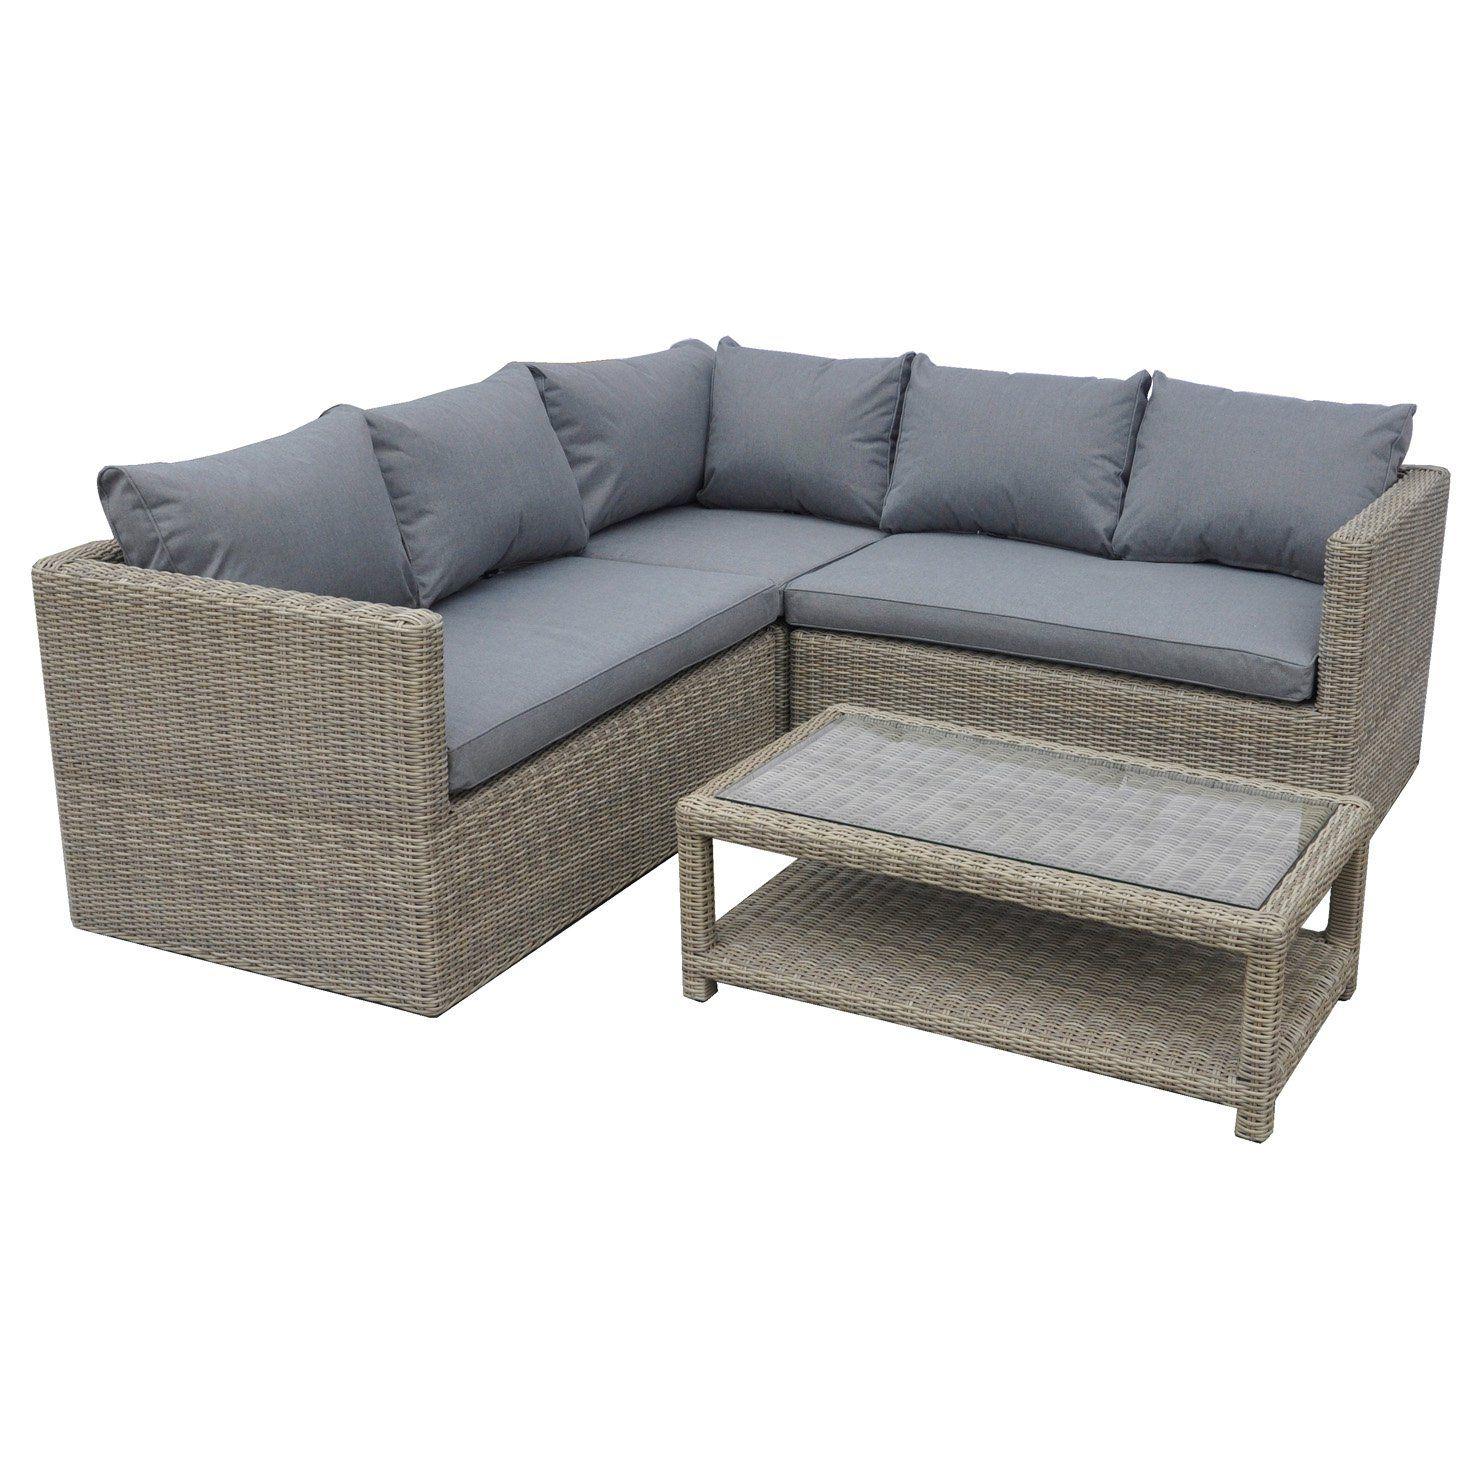 Royal Craft Wentworth Modular Corner Sofa Set – The UK\'s No. 1 ...